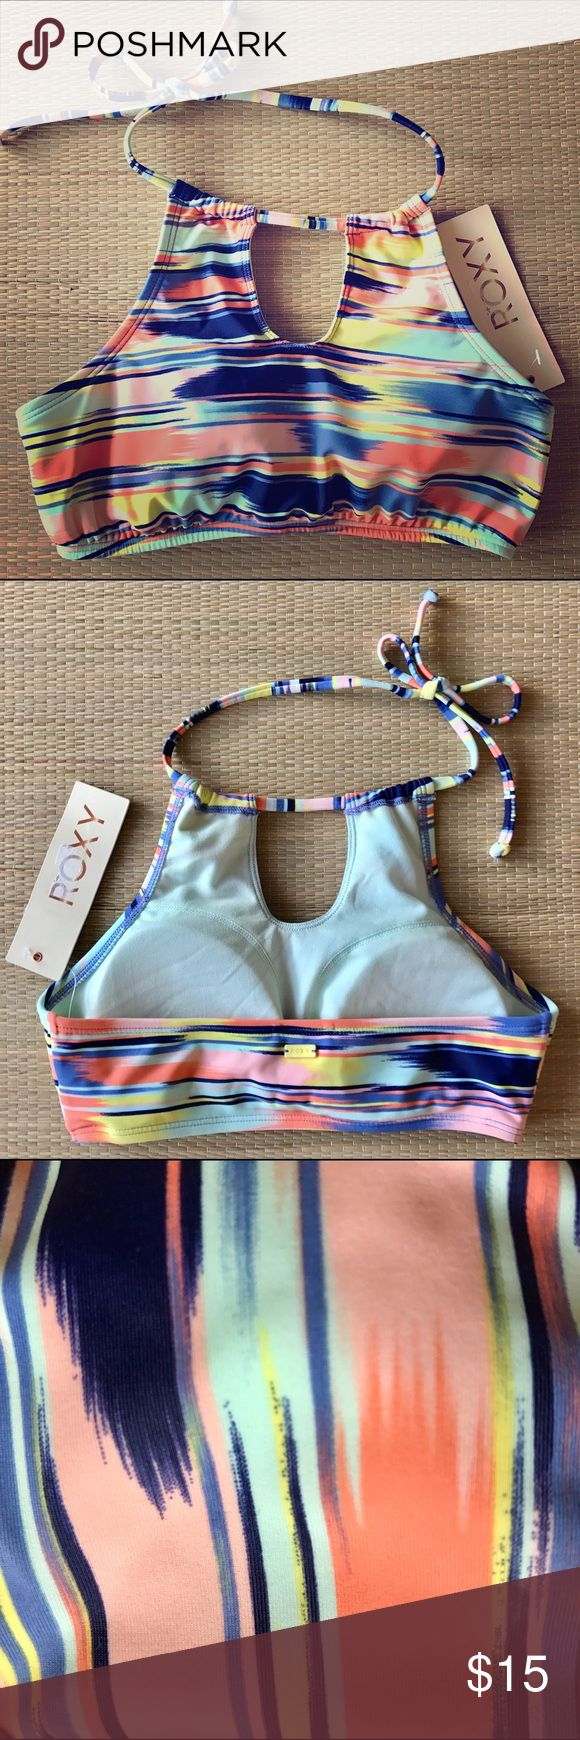 Roxy Bikini Halter Top Super cute Roxy Bikini halter top. New with tags, never worn! Sorry, no trades. Roxy Swim Bikinis